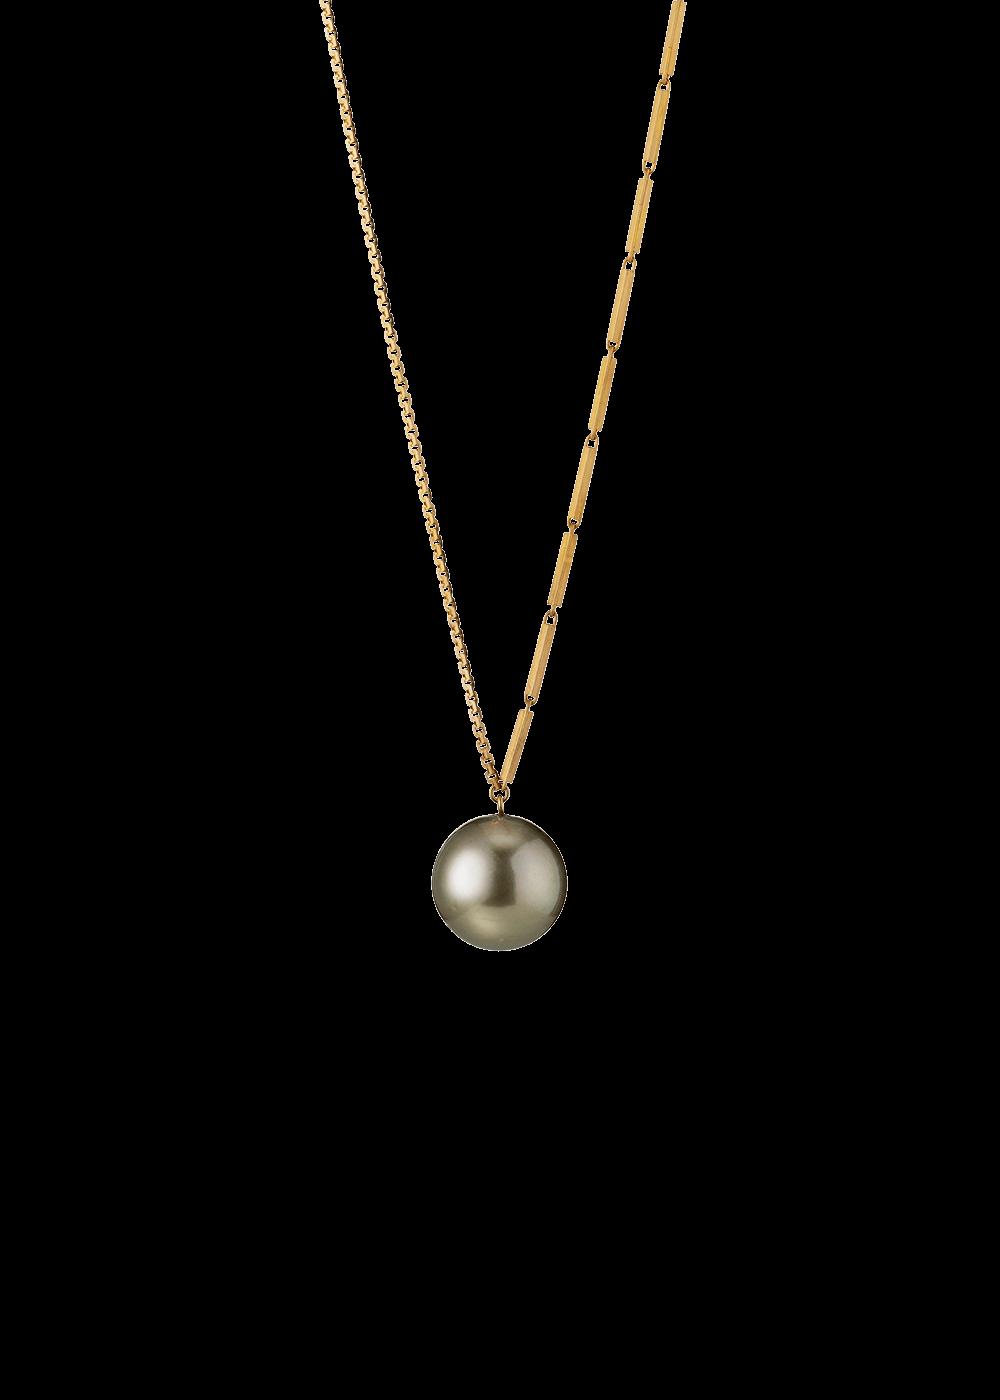 Gellner Perlenhalskette